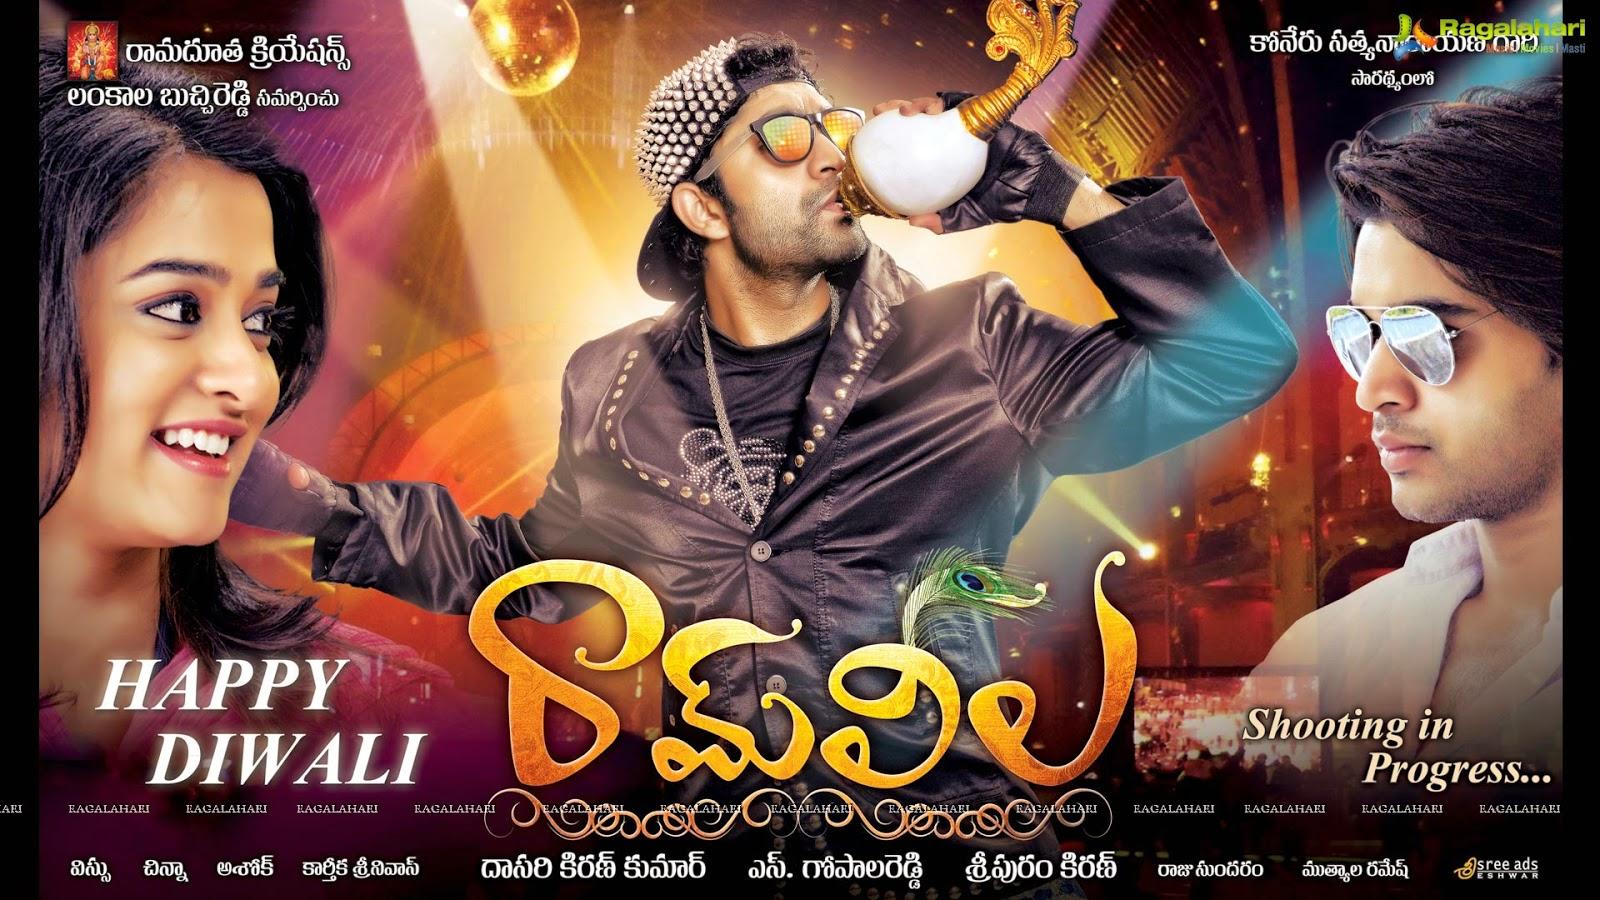 ramleela hindi movie mp3 song download derndisong